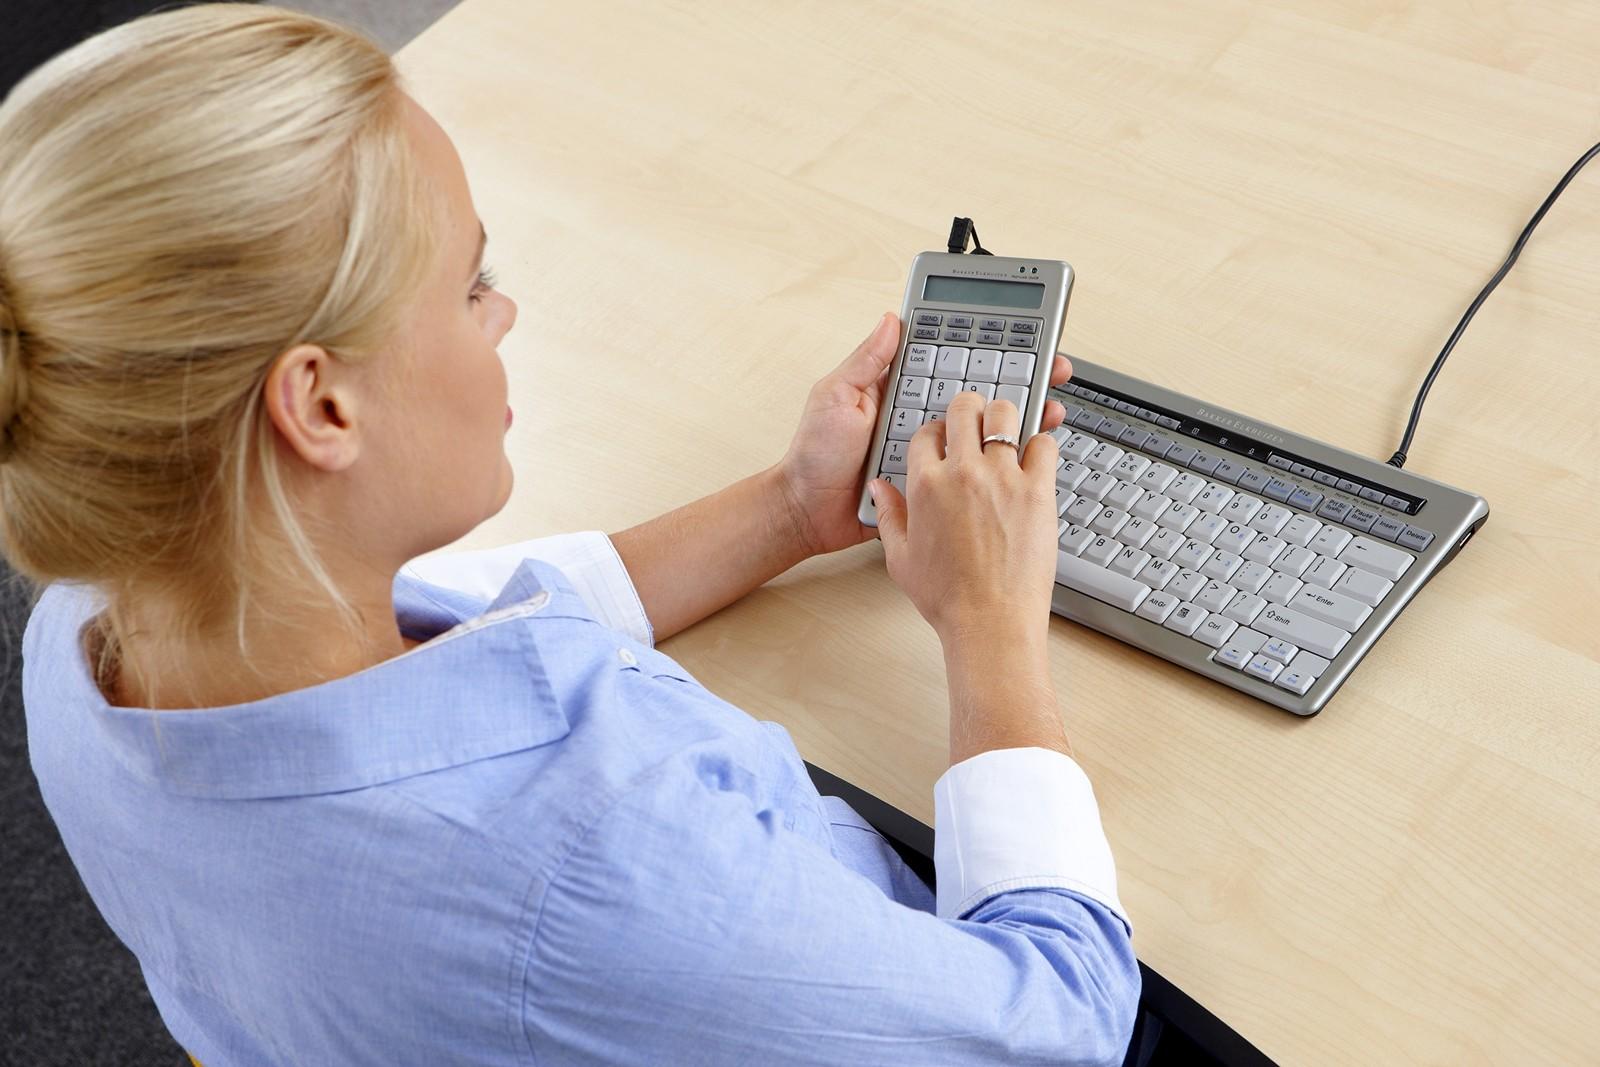 Kompakte Tastatur S-Board-840 von BakkerElkhuizen